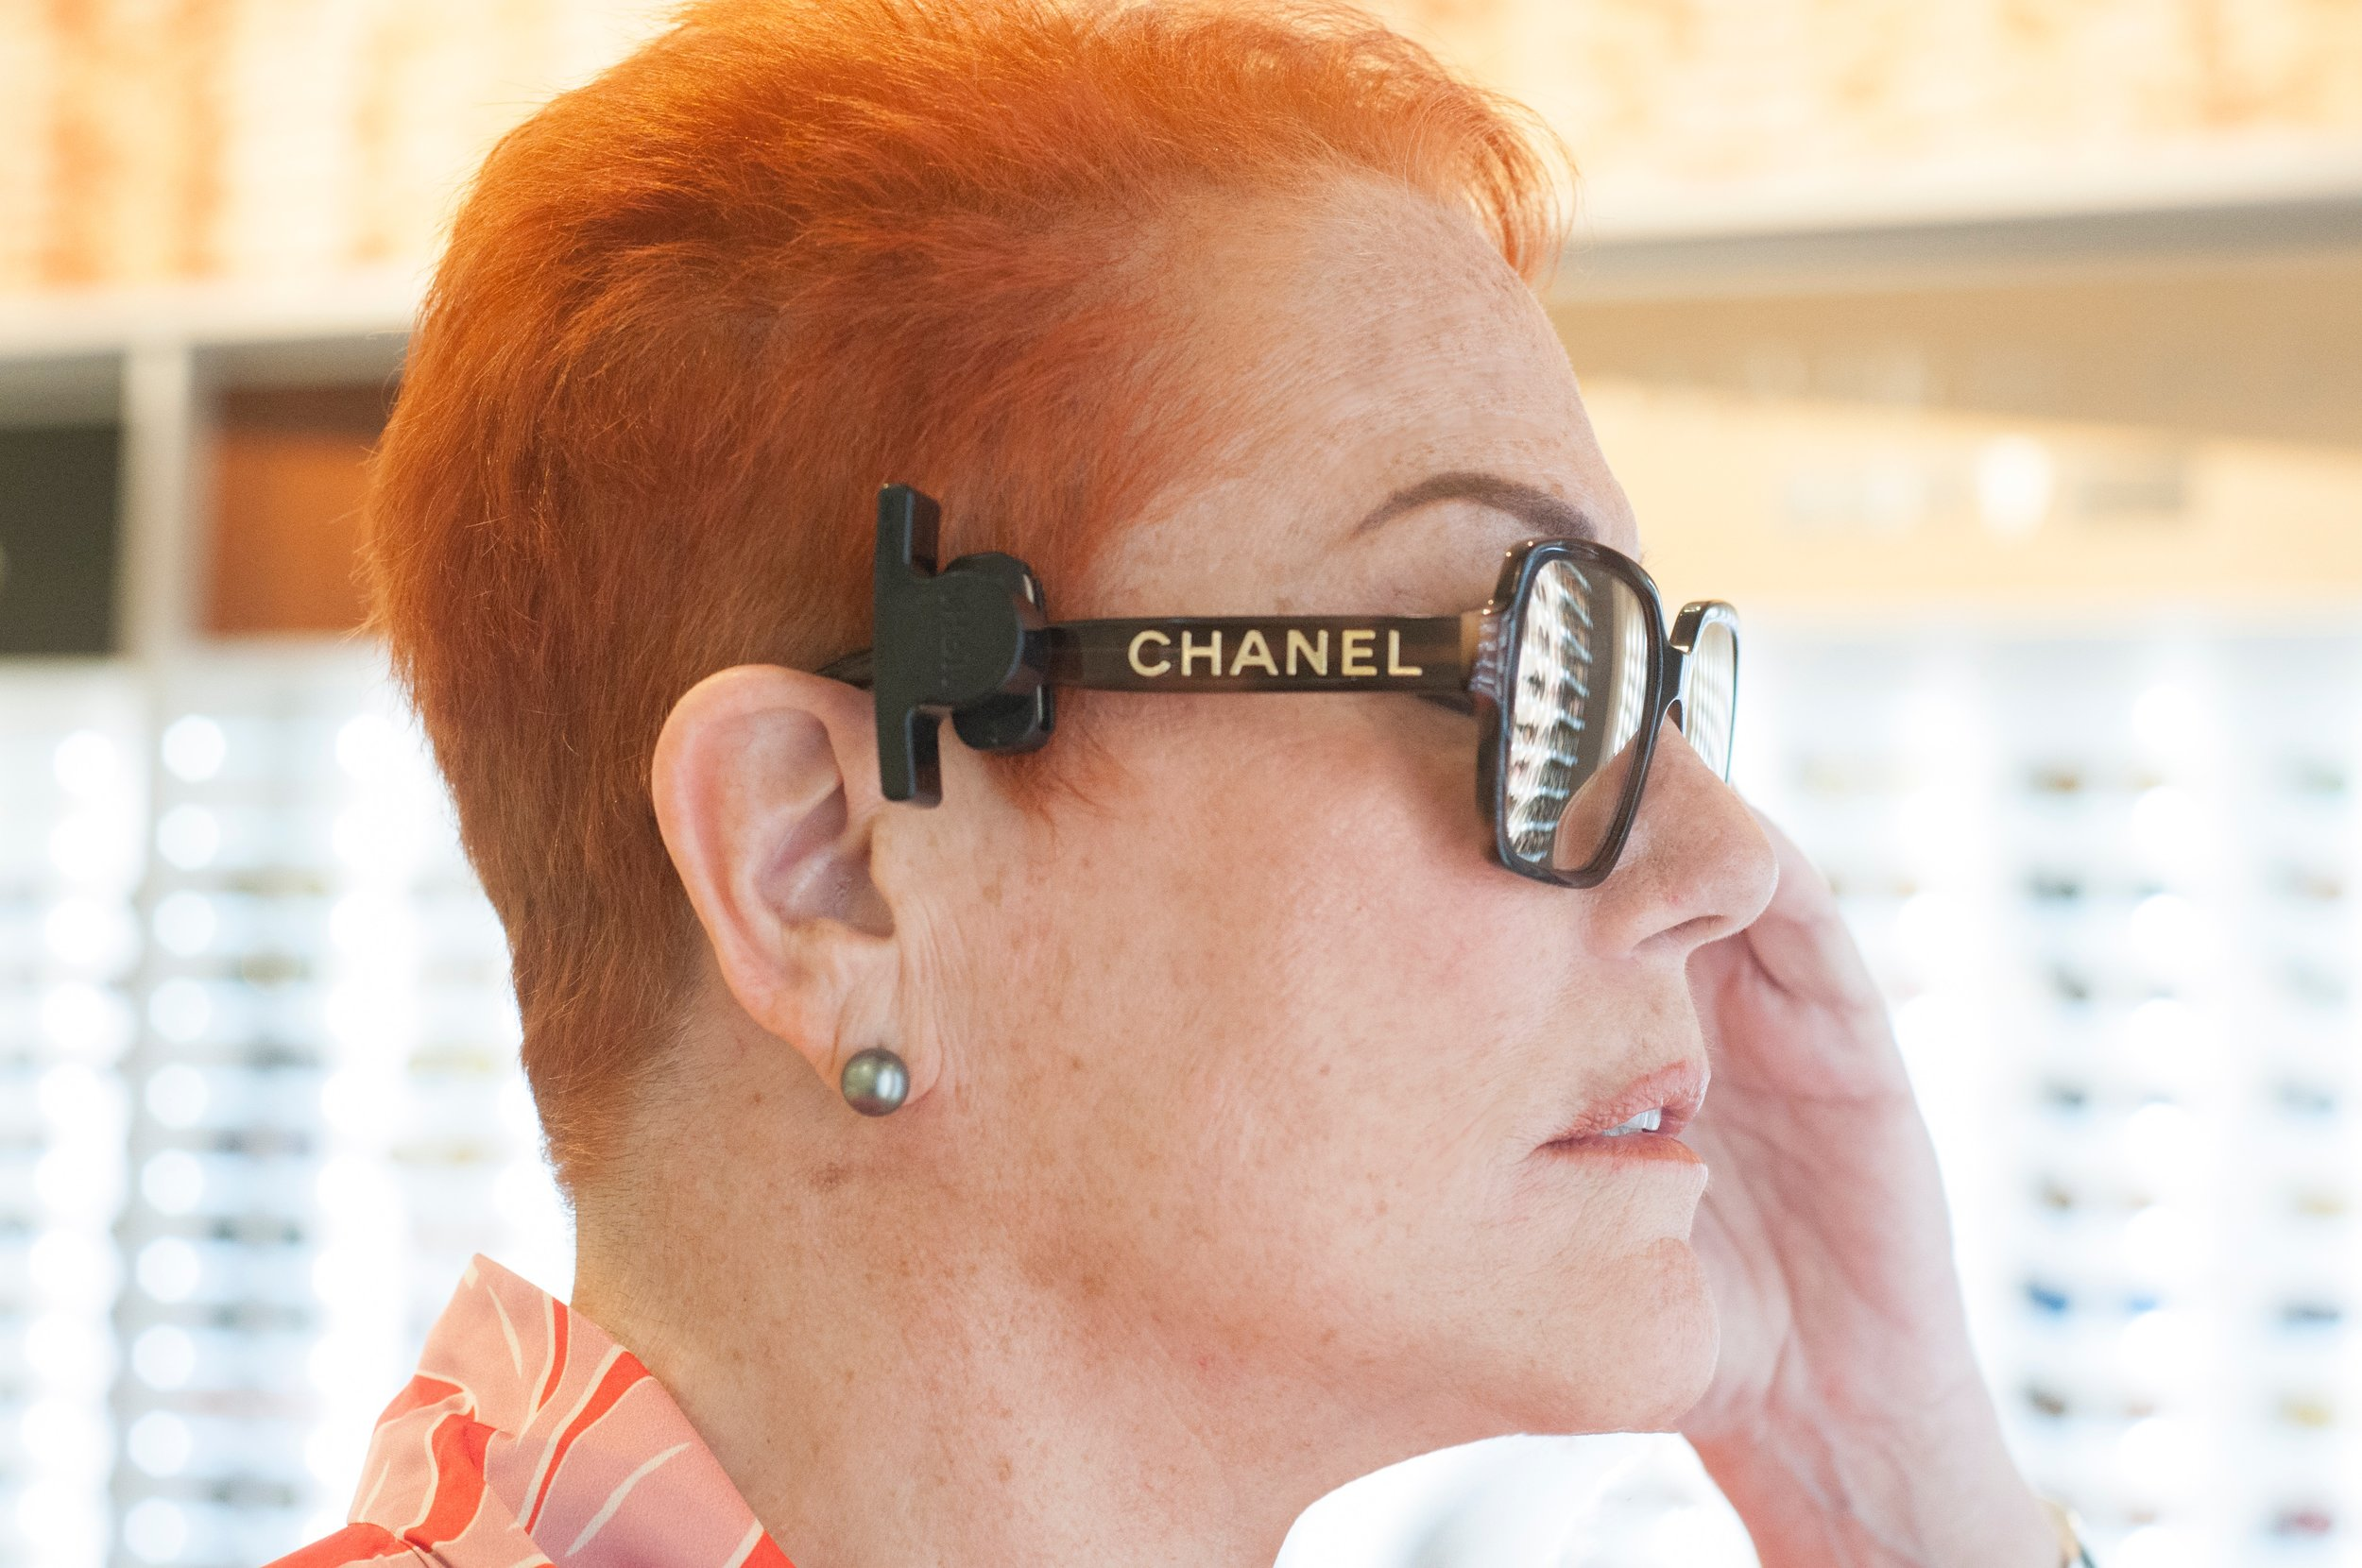 lindsay-sunglasses-chanel.jpg